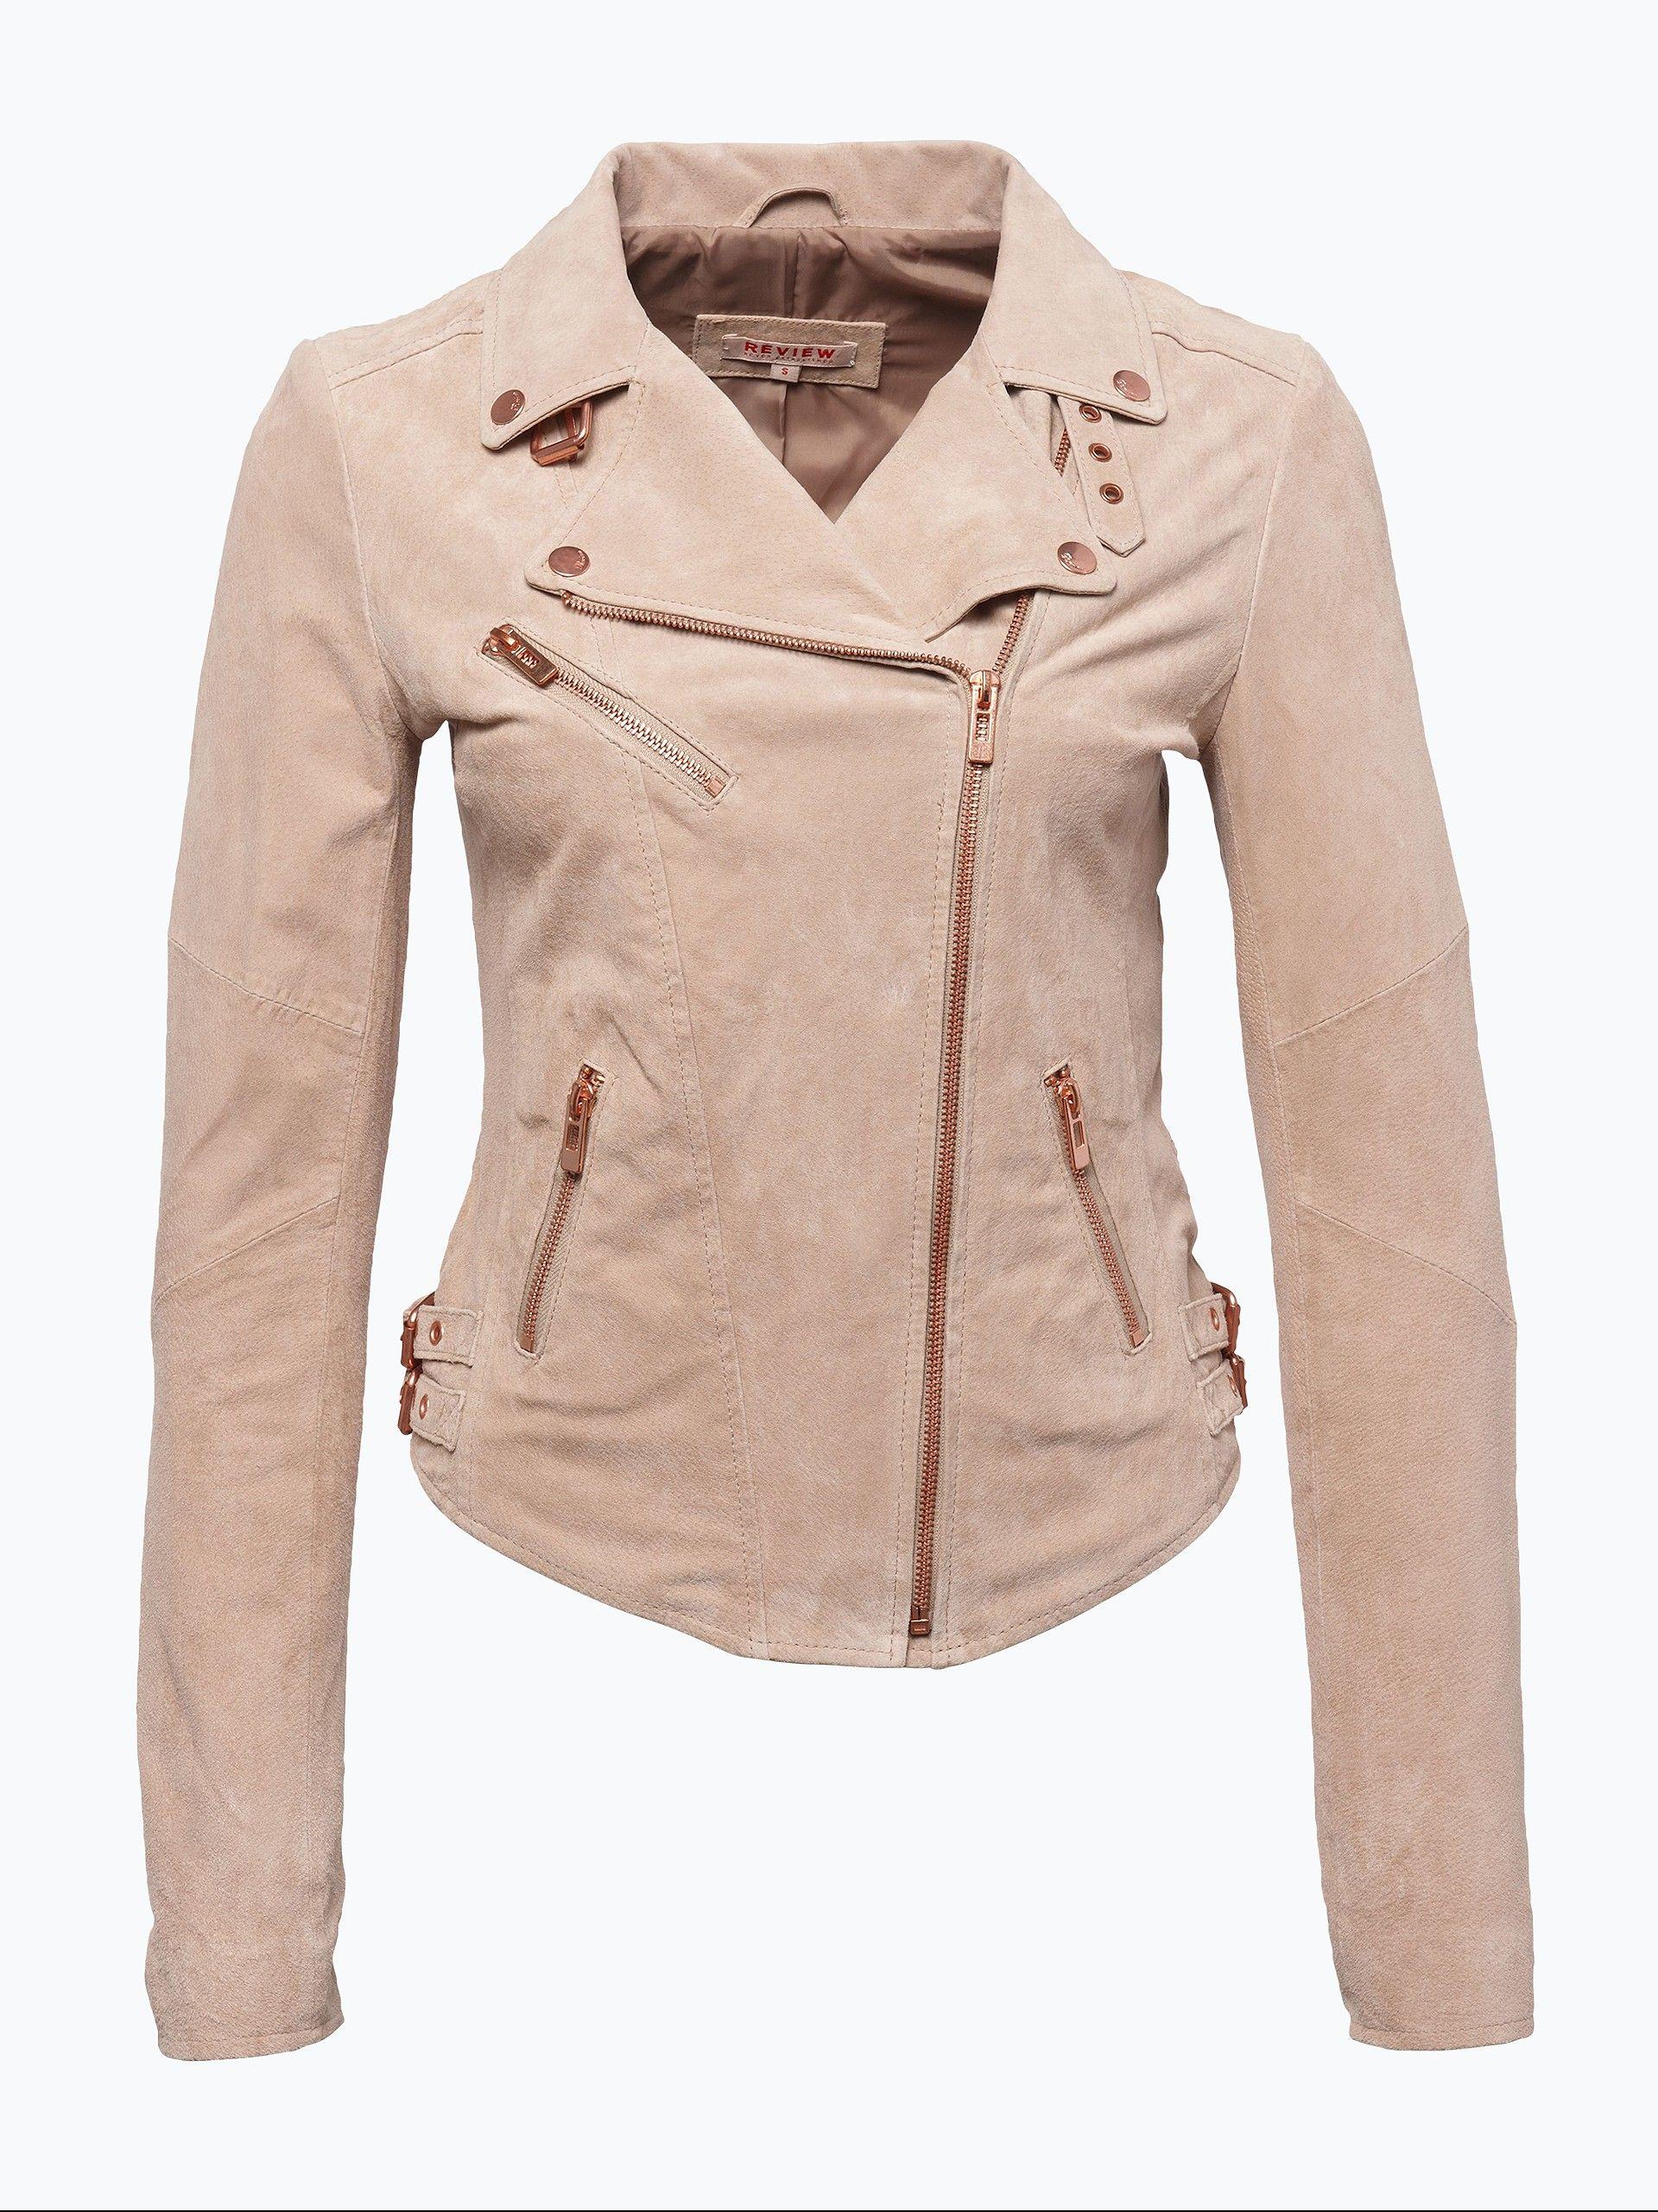 Damen Lederjacke Review (119,95 EURO) bei VAN GRAAF kaufen